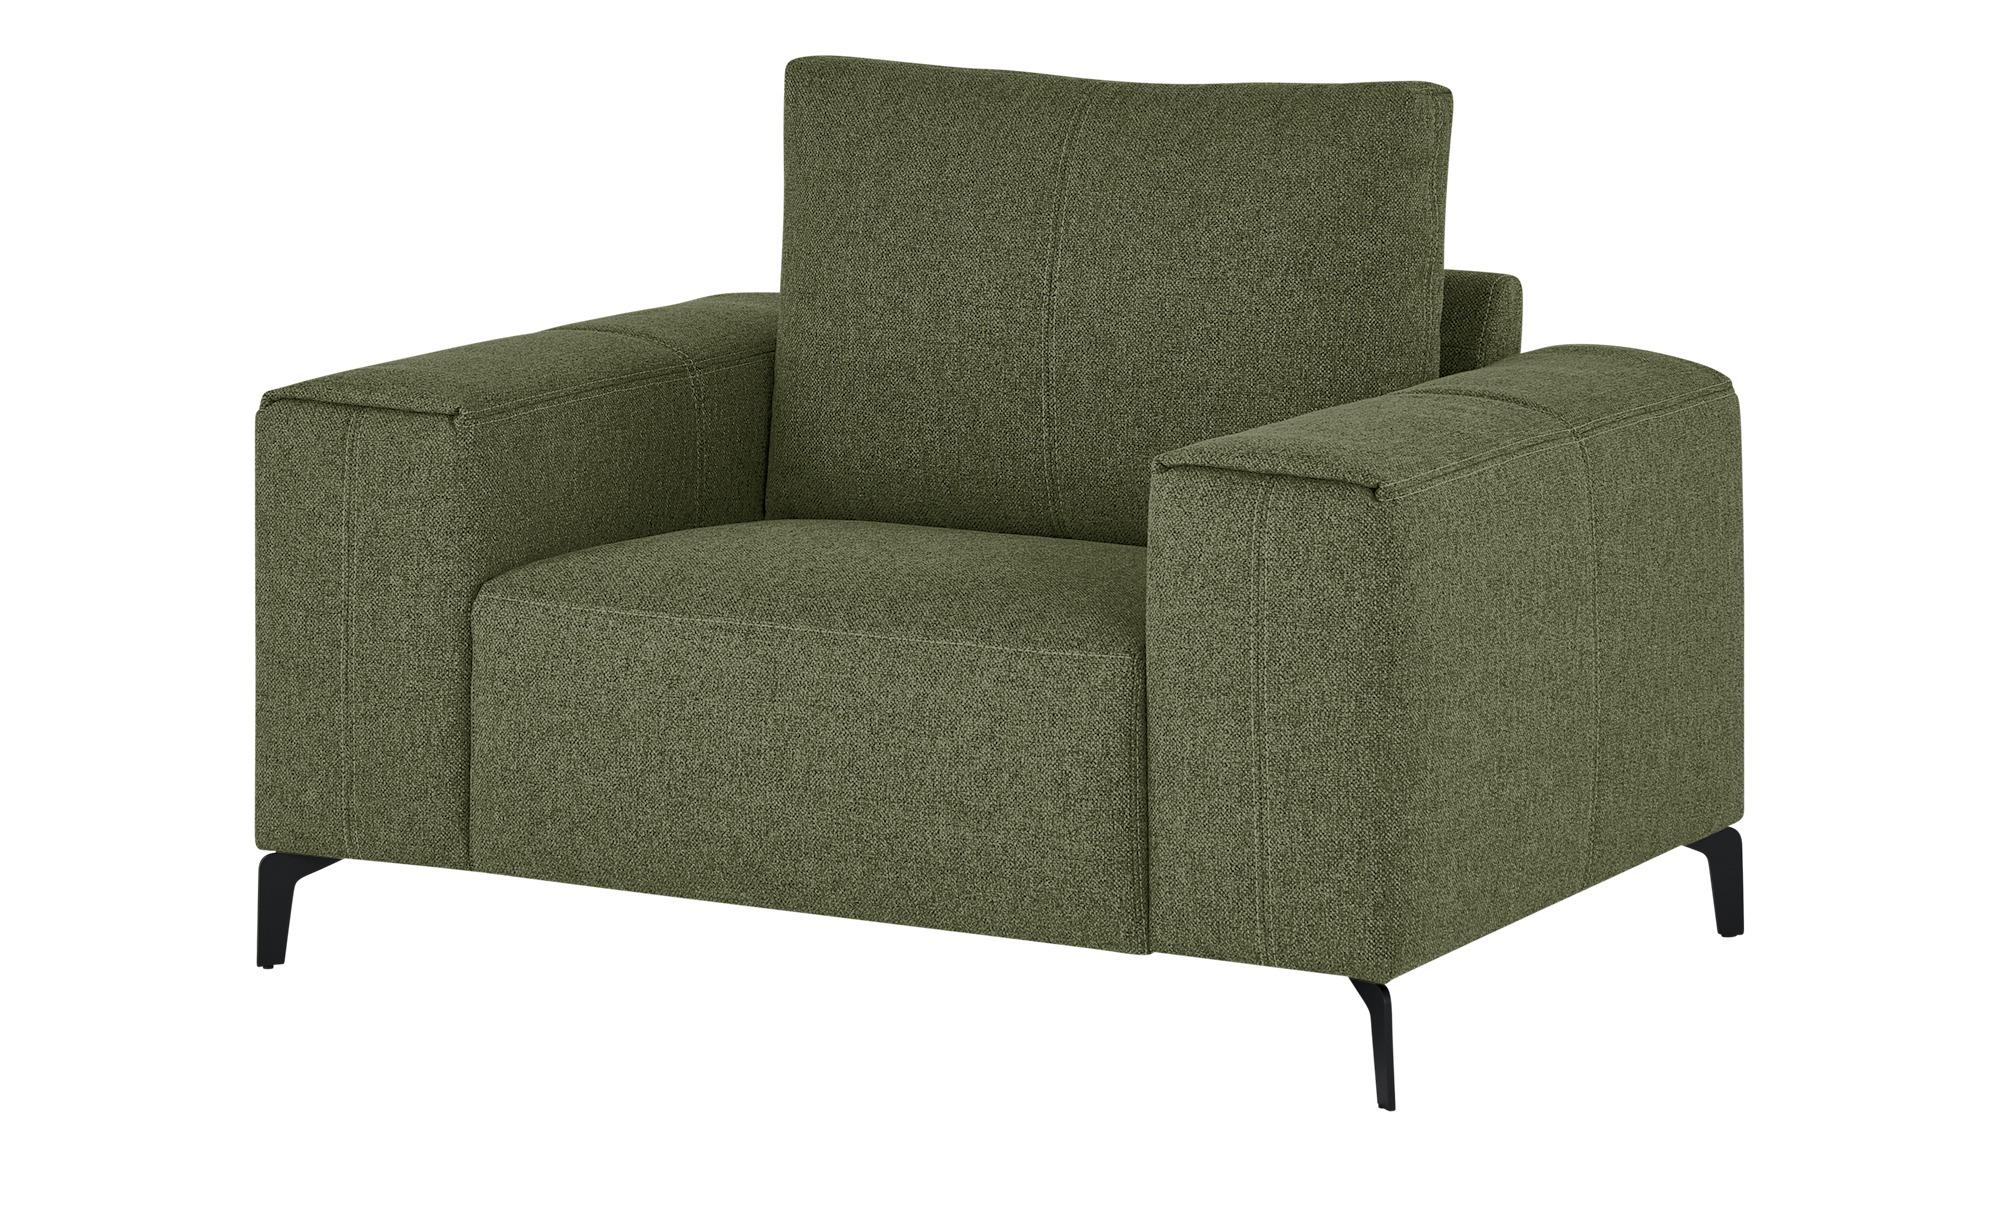 smart Sessel  Gabriela ¦ grün ¦ Maße (cm): B: 127 H: 90 T: 91 Polstermöbel > Sessel > Polstersessel - Höffner